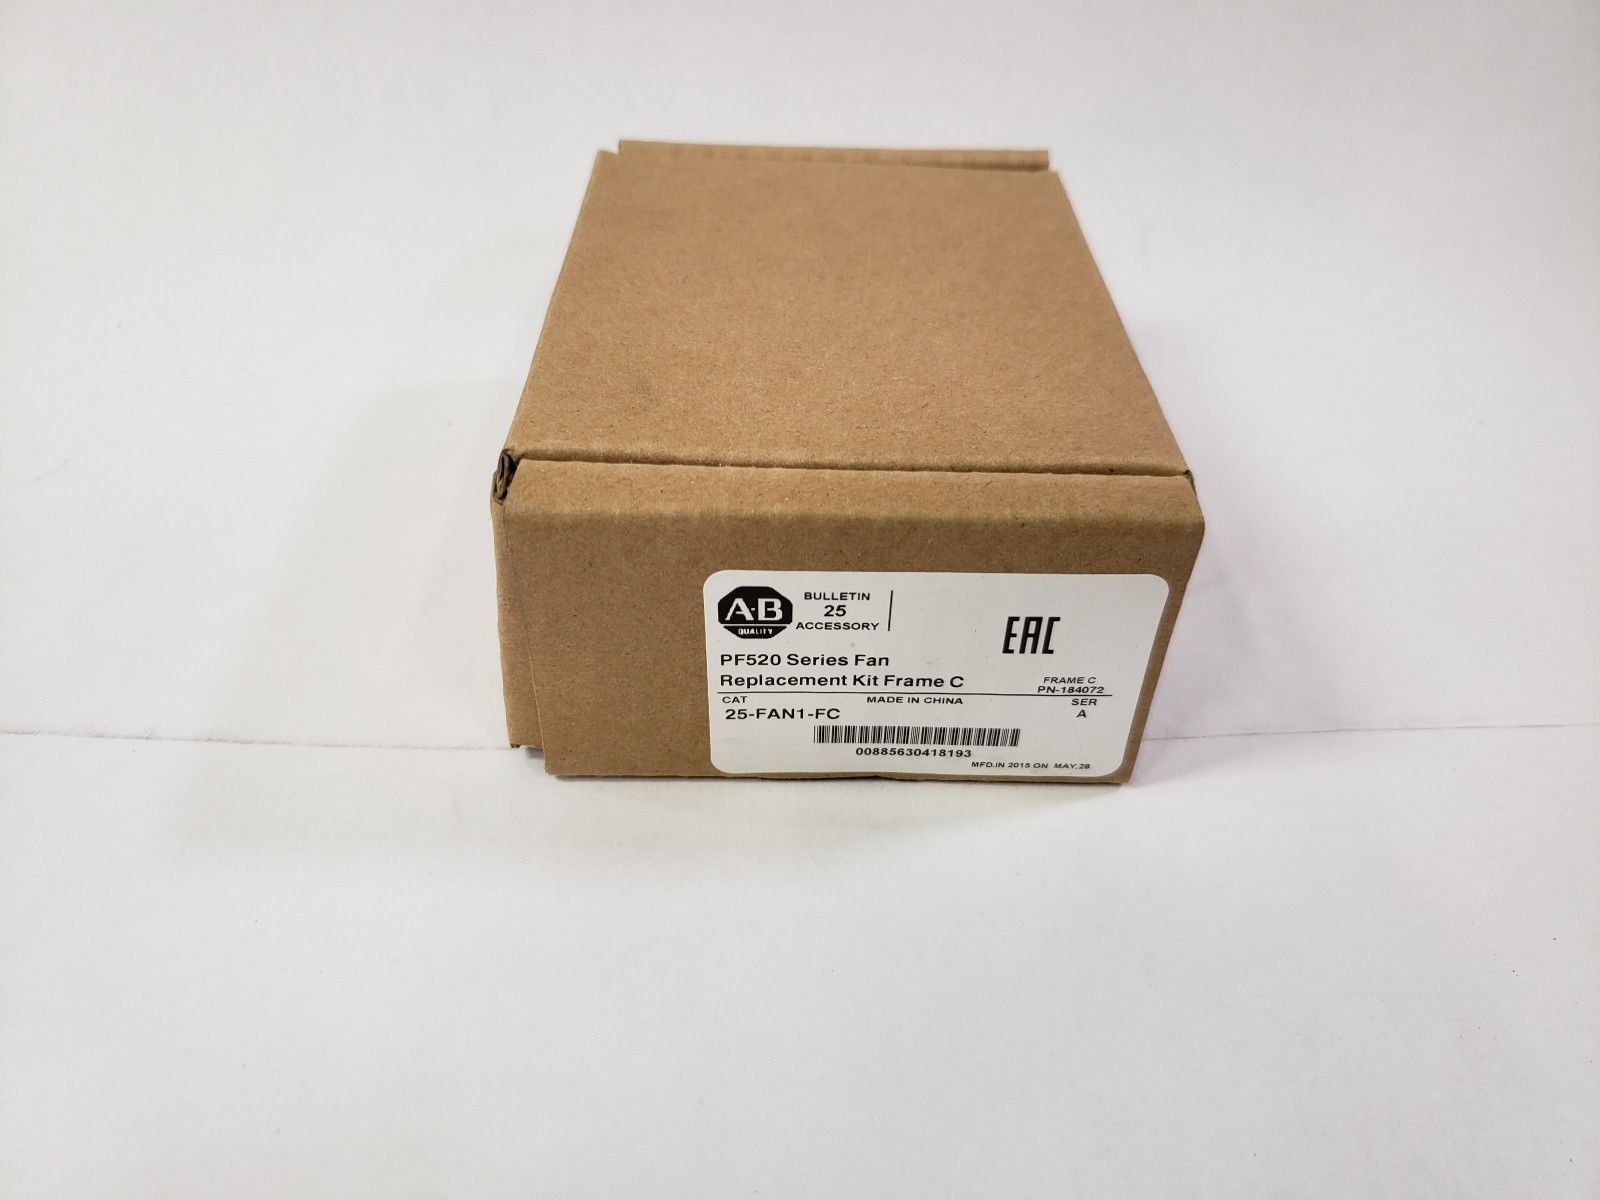 Lot 15A - New Allen Bradley PF520 Series Fan Replacement Kit Frame